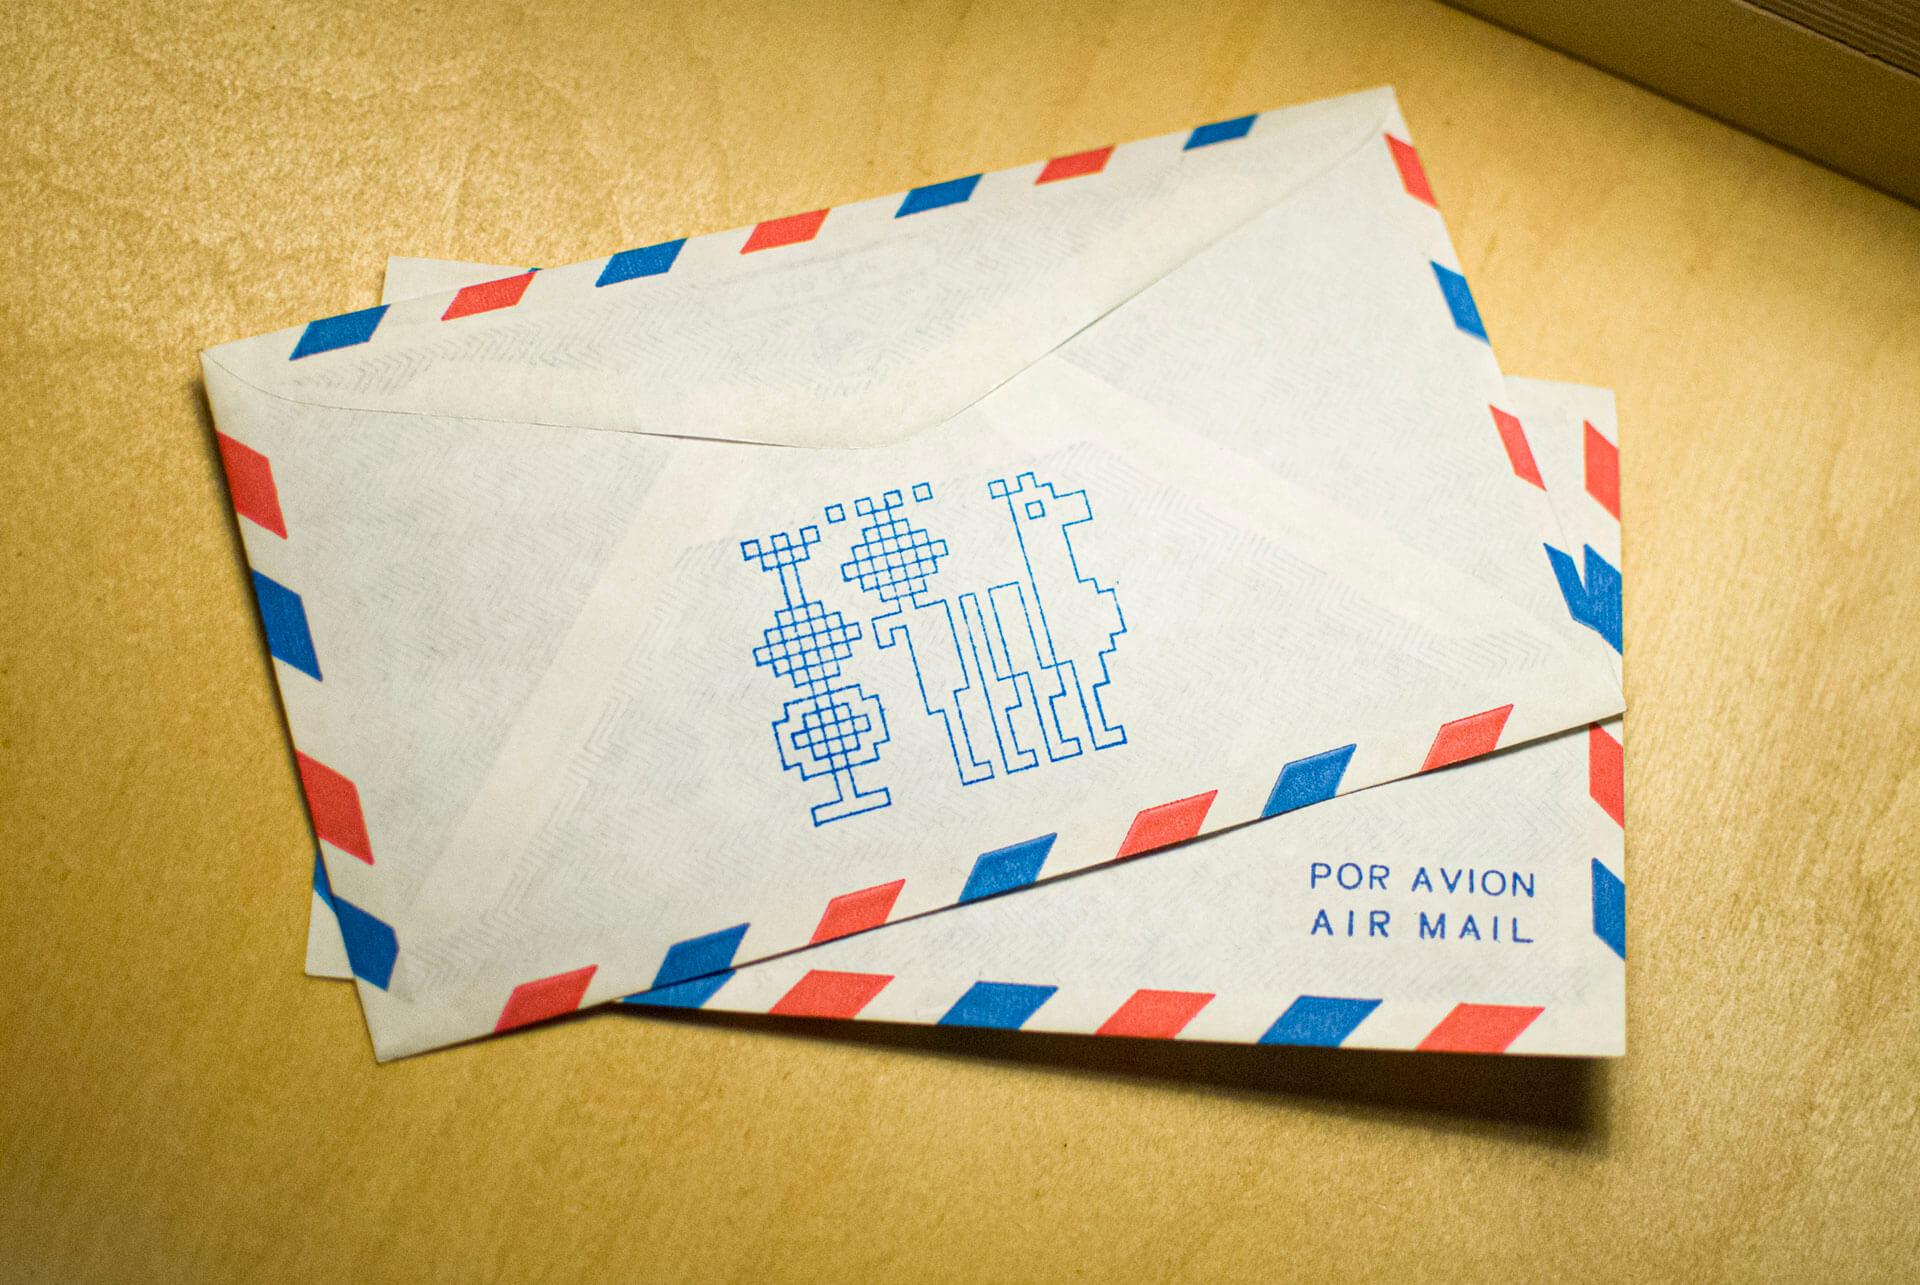 studio-malagon-pico-picante-envelope-01